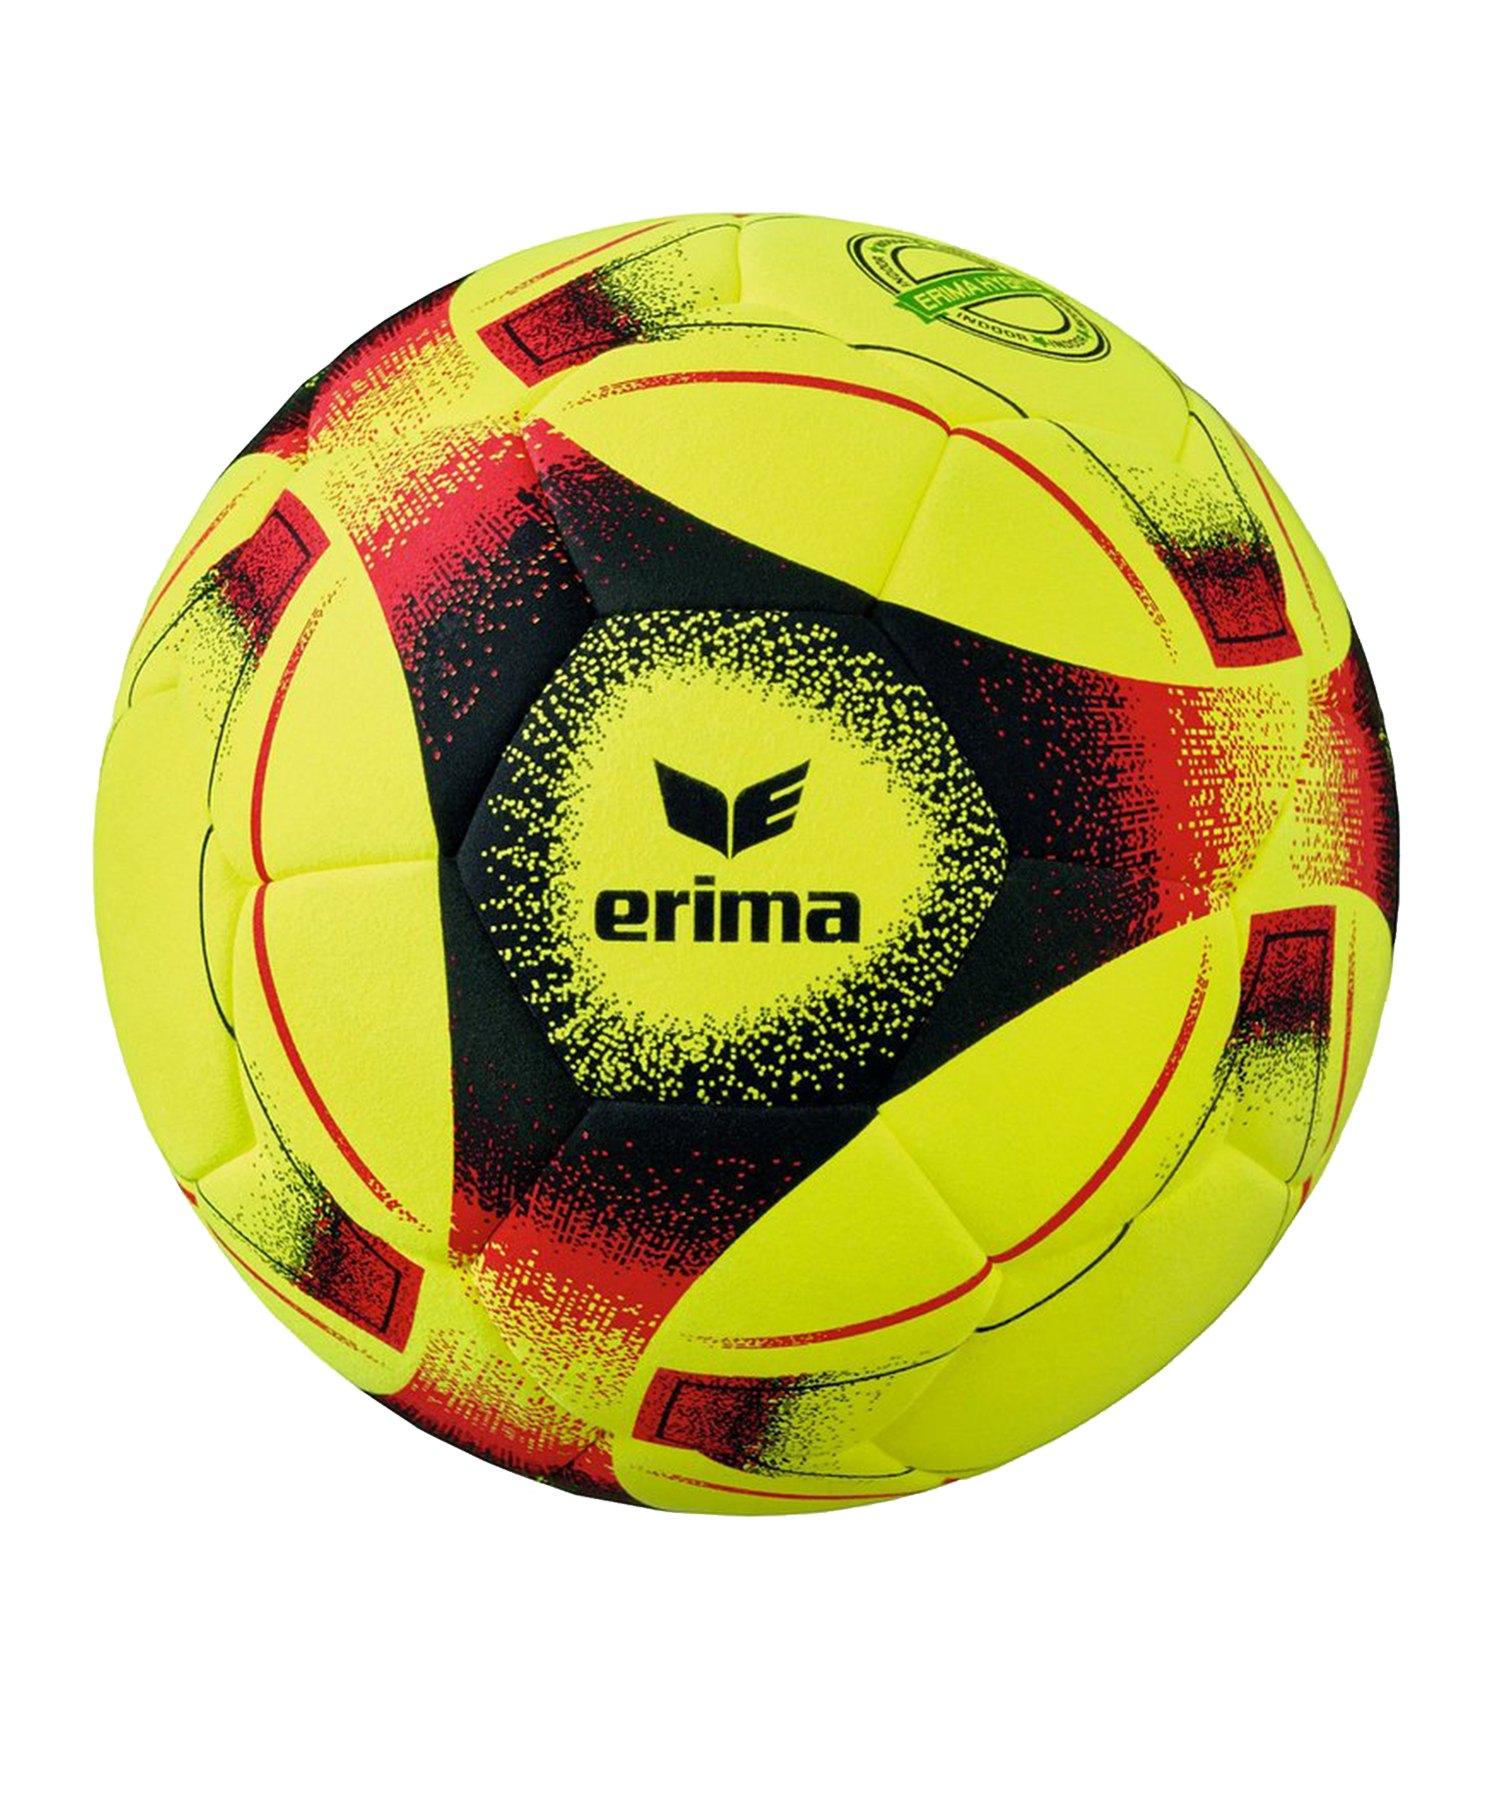 Erima ERIMA Hybrid Indoor Gr.4 Gelb Rot - Gelb